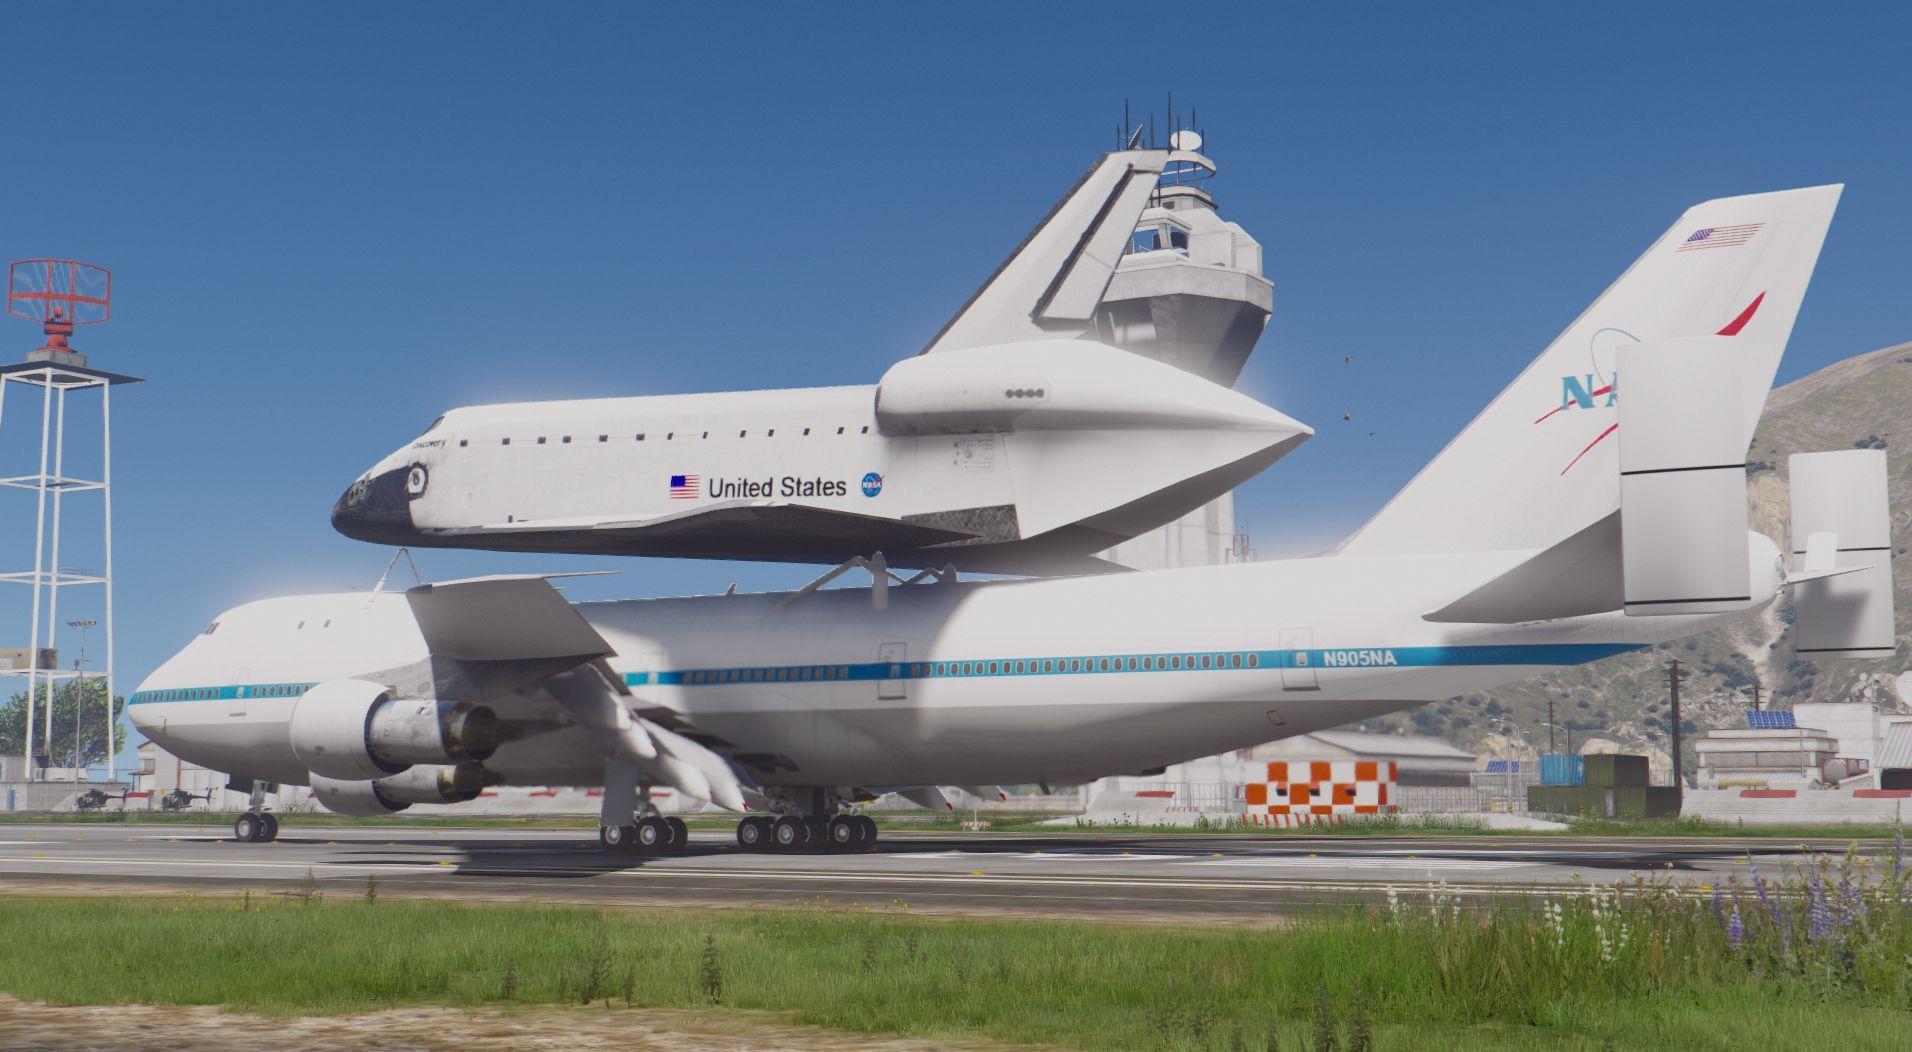 space shuttle znacenje - photo #25